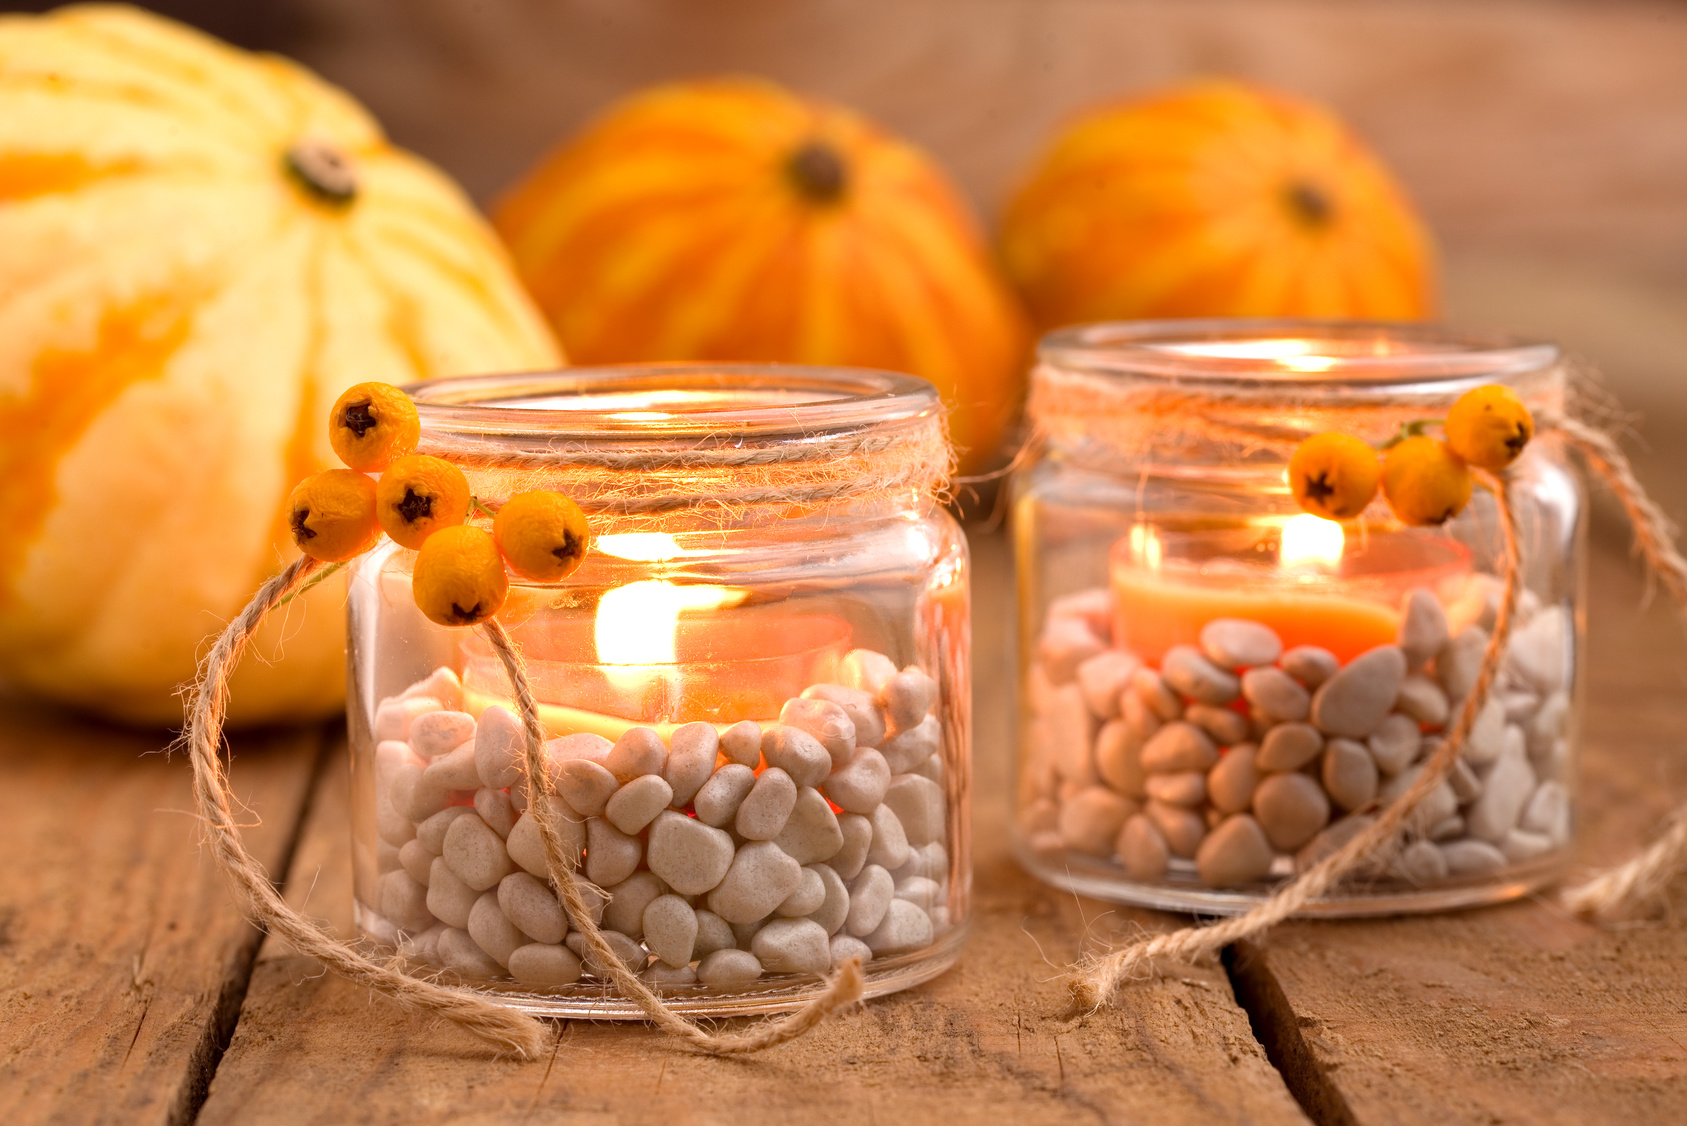 Teelichtgläser mit Herbstdeko